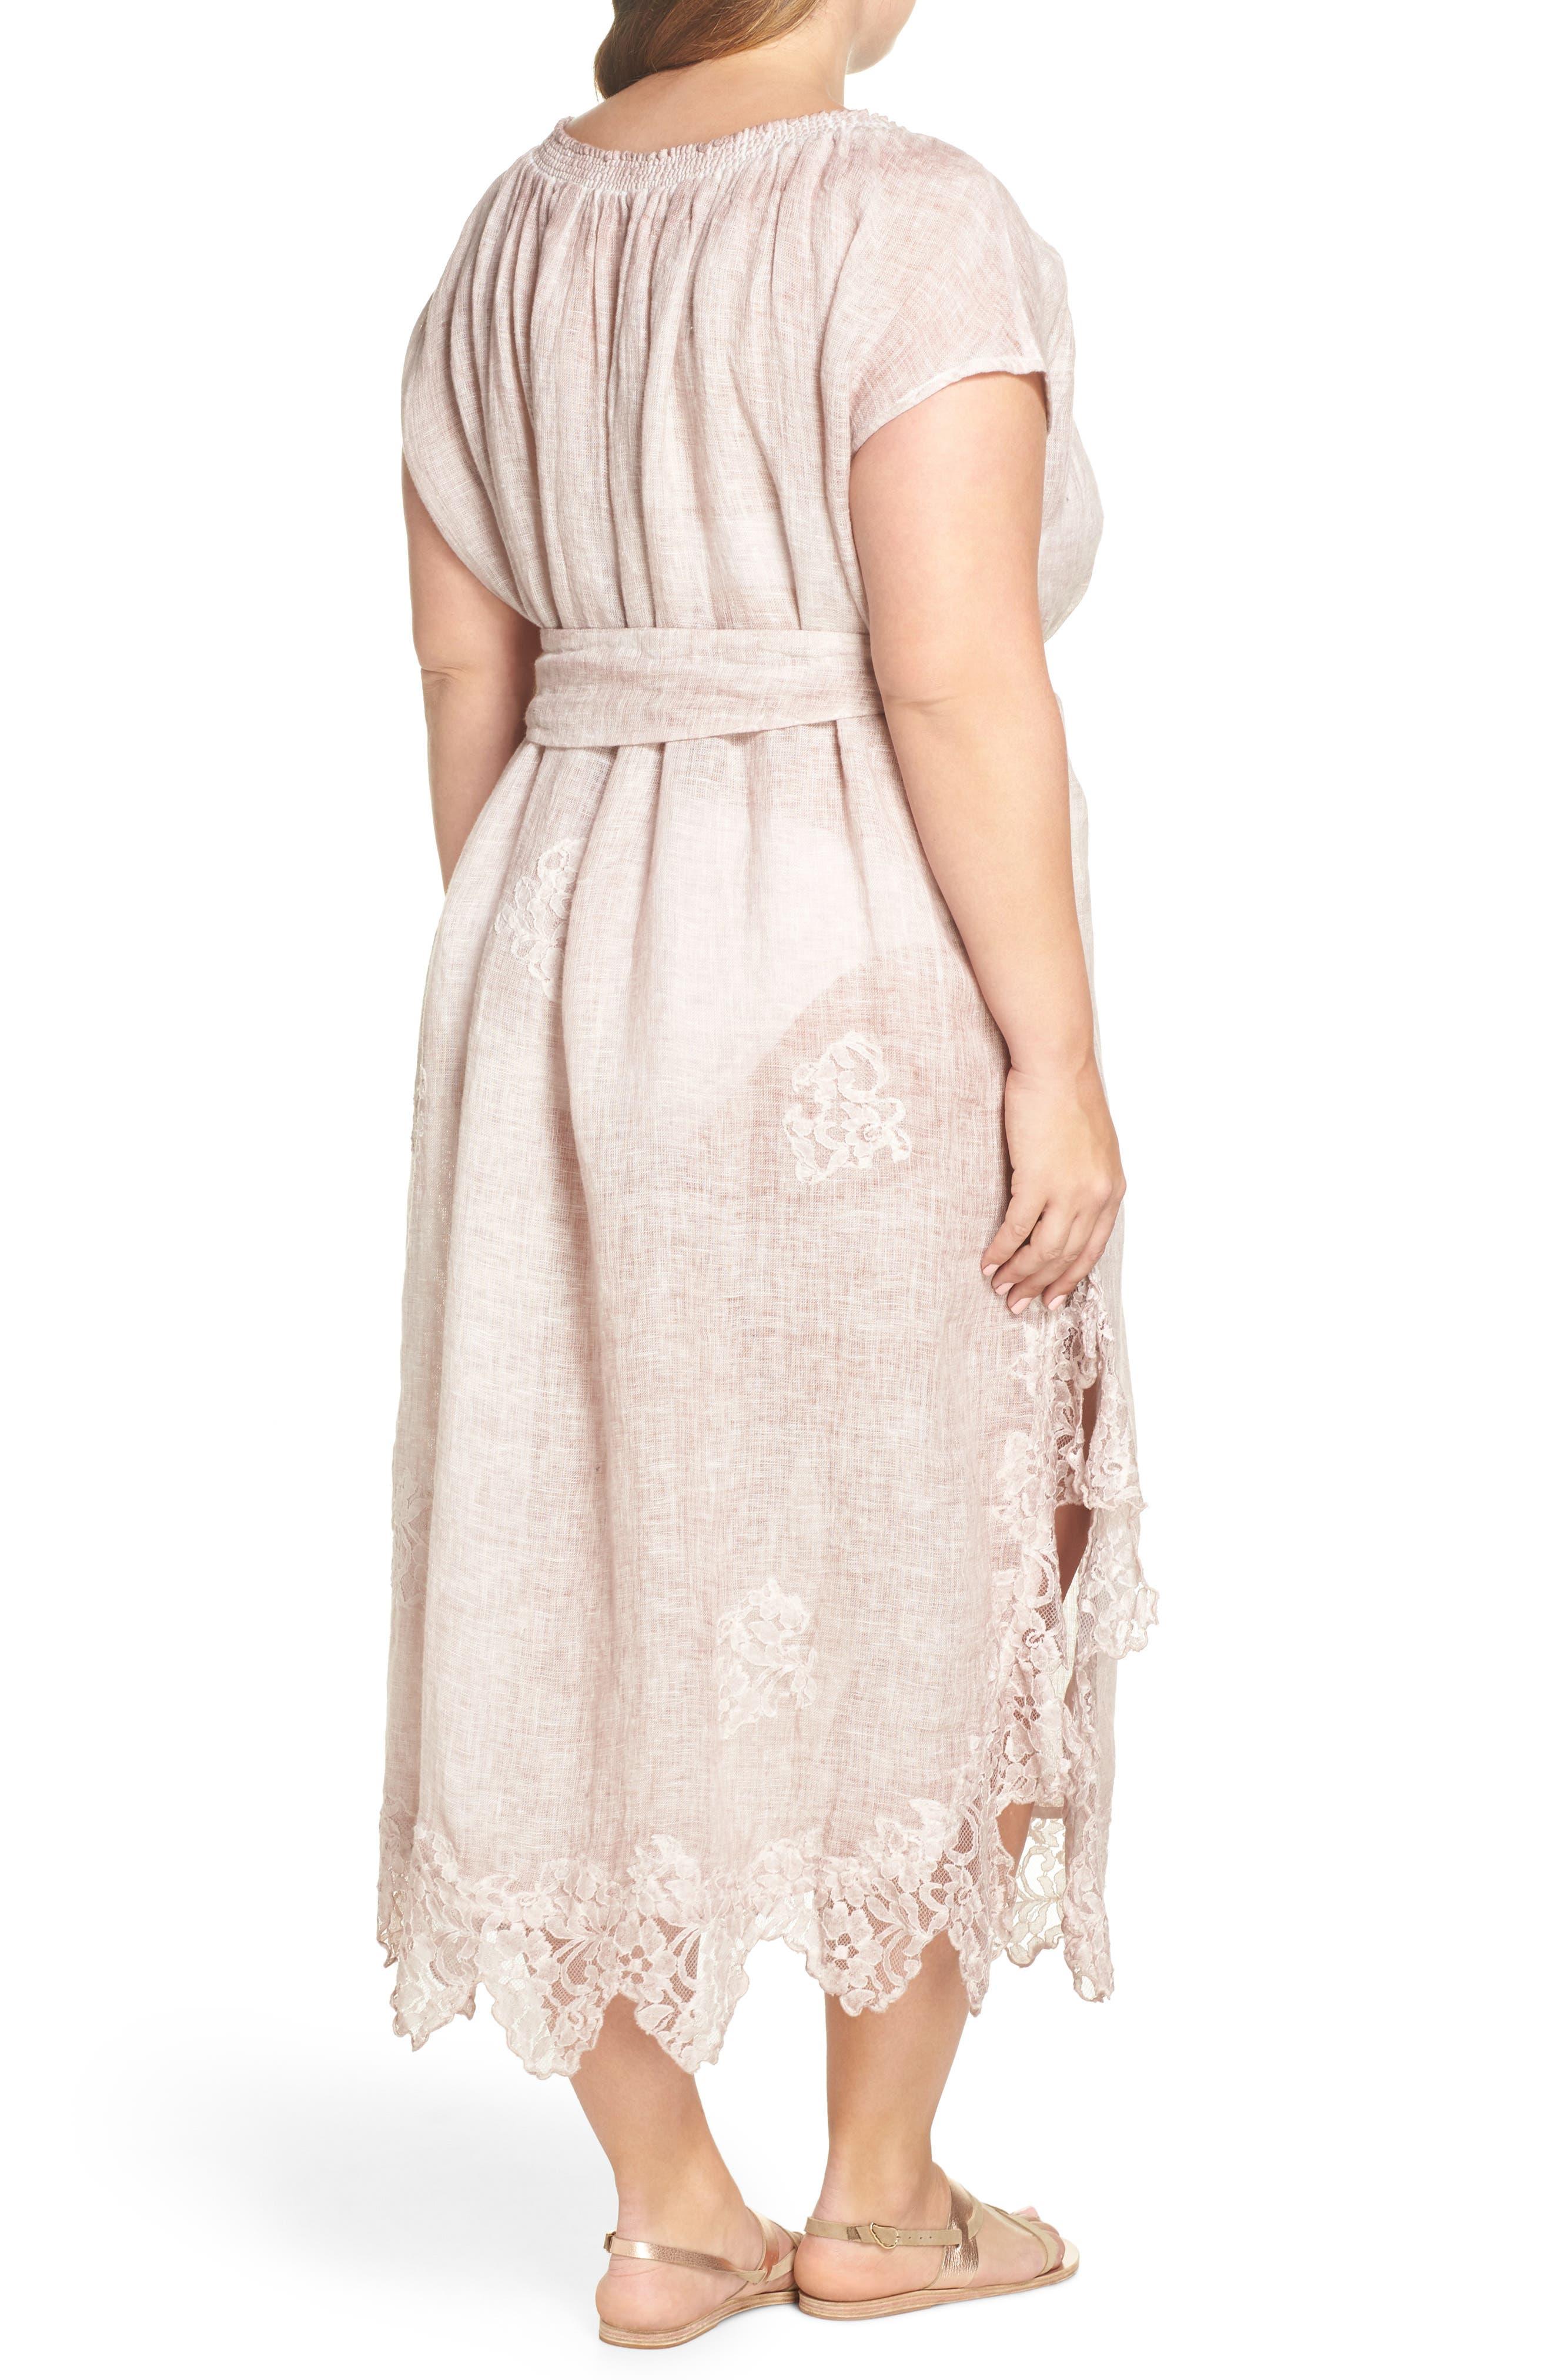 Daisy Linen Cover-Up Dress,                             Alternate thumbnail 2, color,                             652